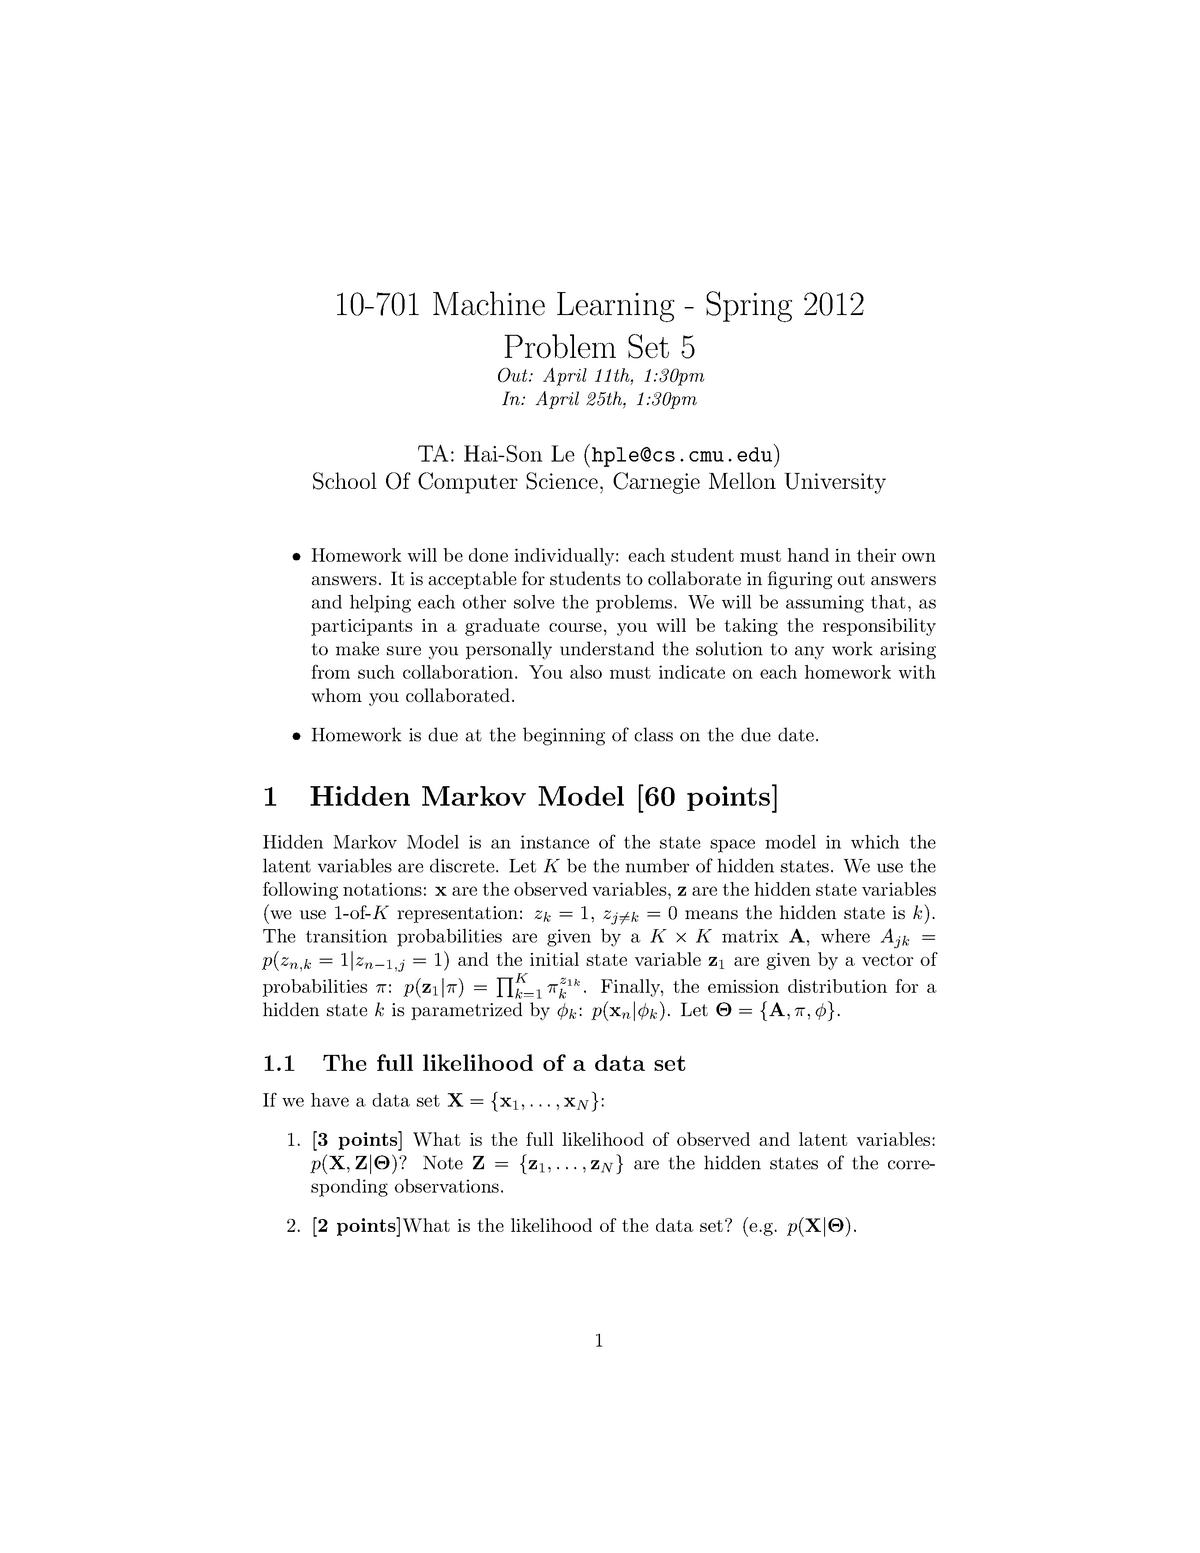 Problem set 5 Machine Learning - 10-701: Machine Learning